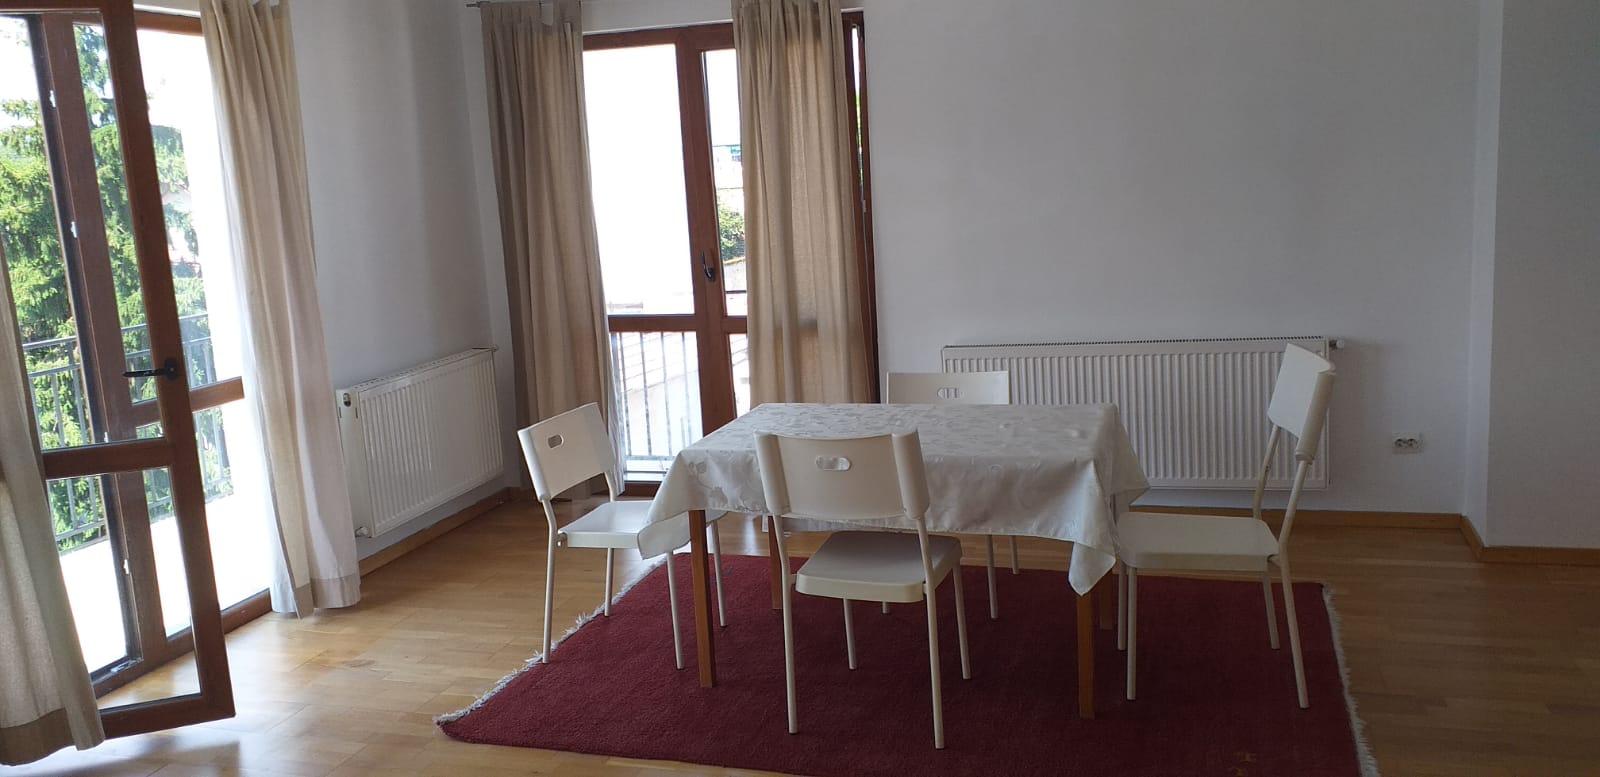 182166-Inchiriere apartament 2 camere, Centru, Cluj-Napoca